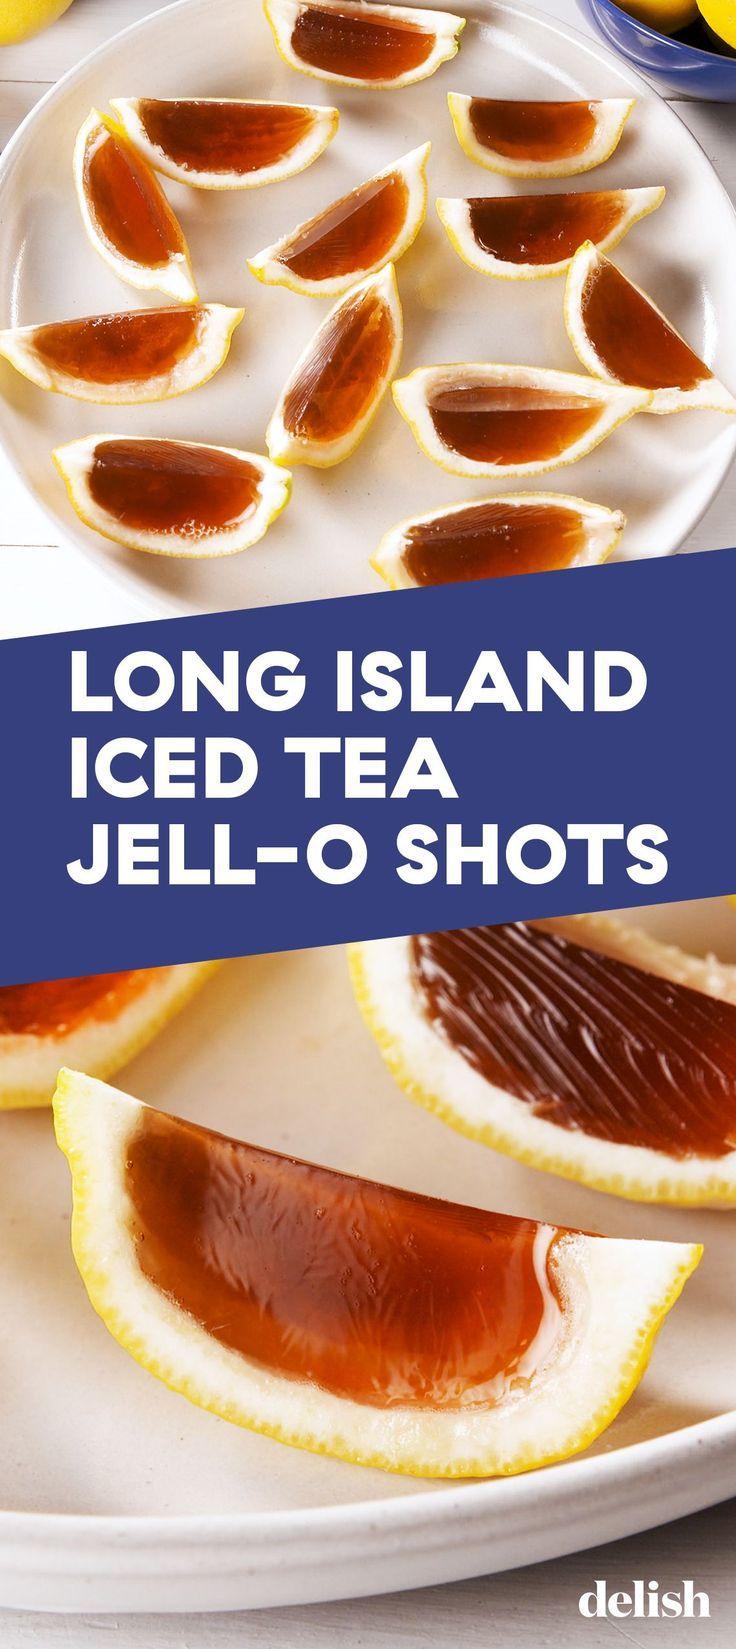 Long Island Iced Tea Jell O Shots Long John Silvers Hush Puppies With Milk Egg Egg Hush Iced Island Jello John Yeme Icme Shot Tarifleri Buzlu Cay